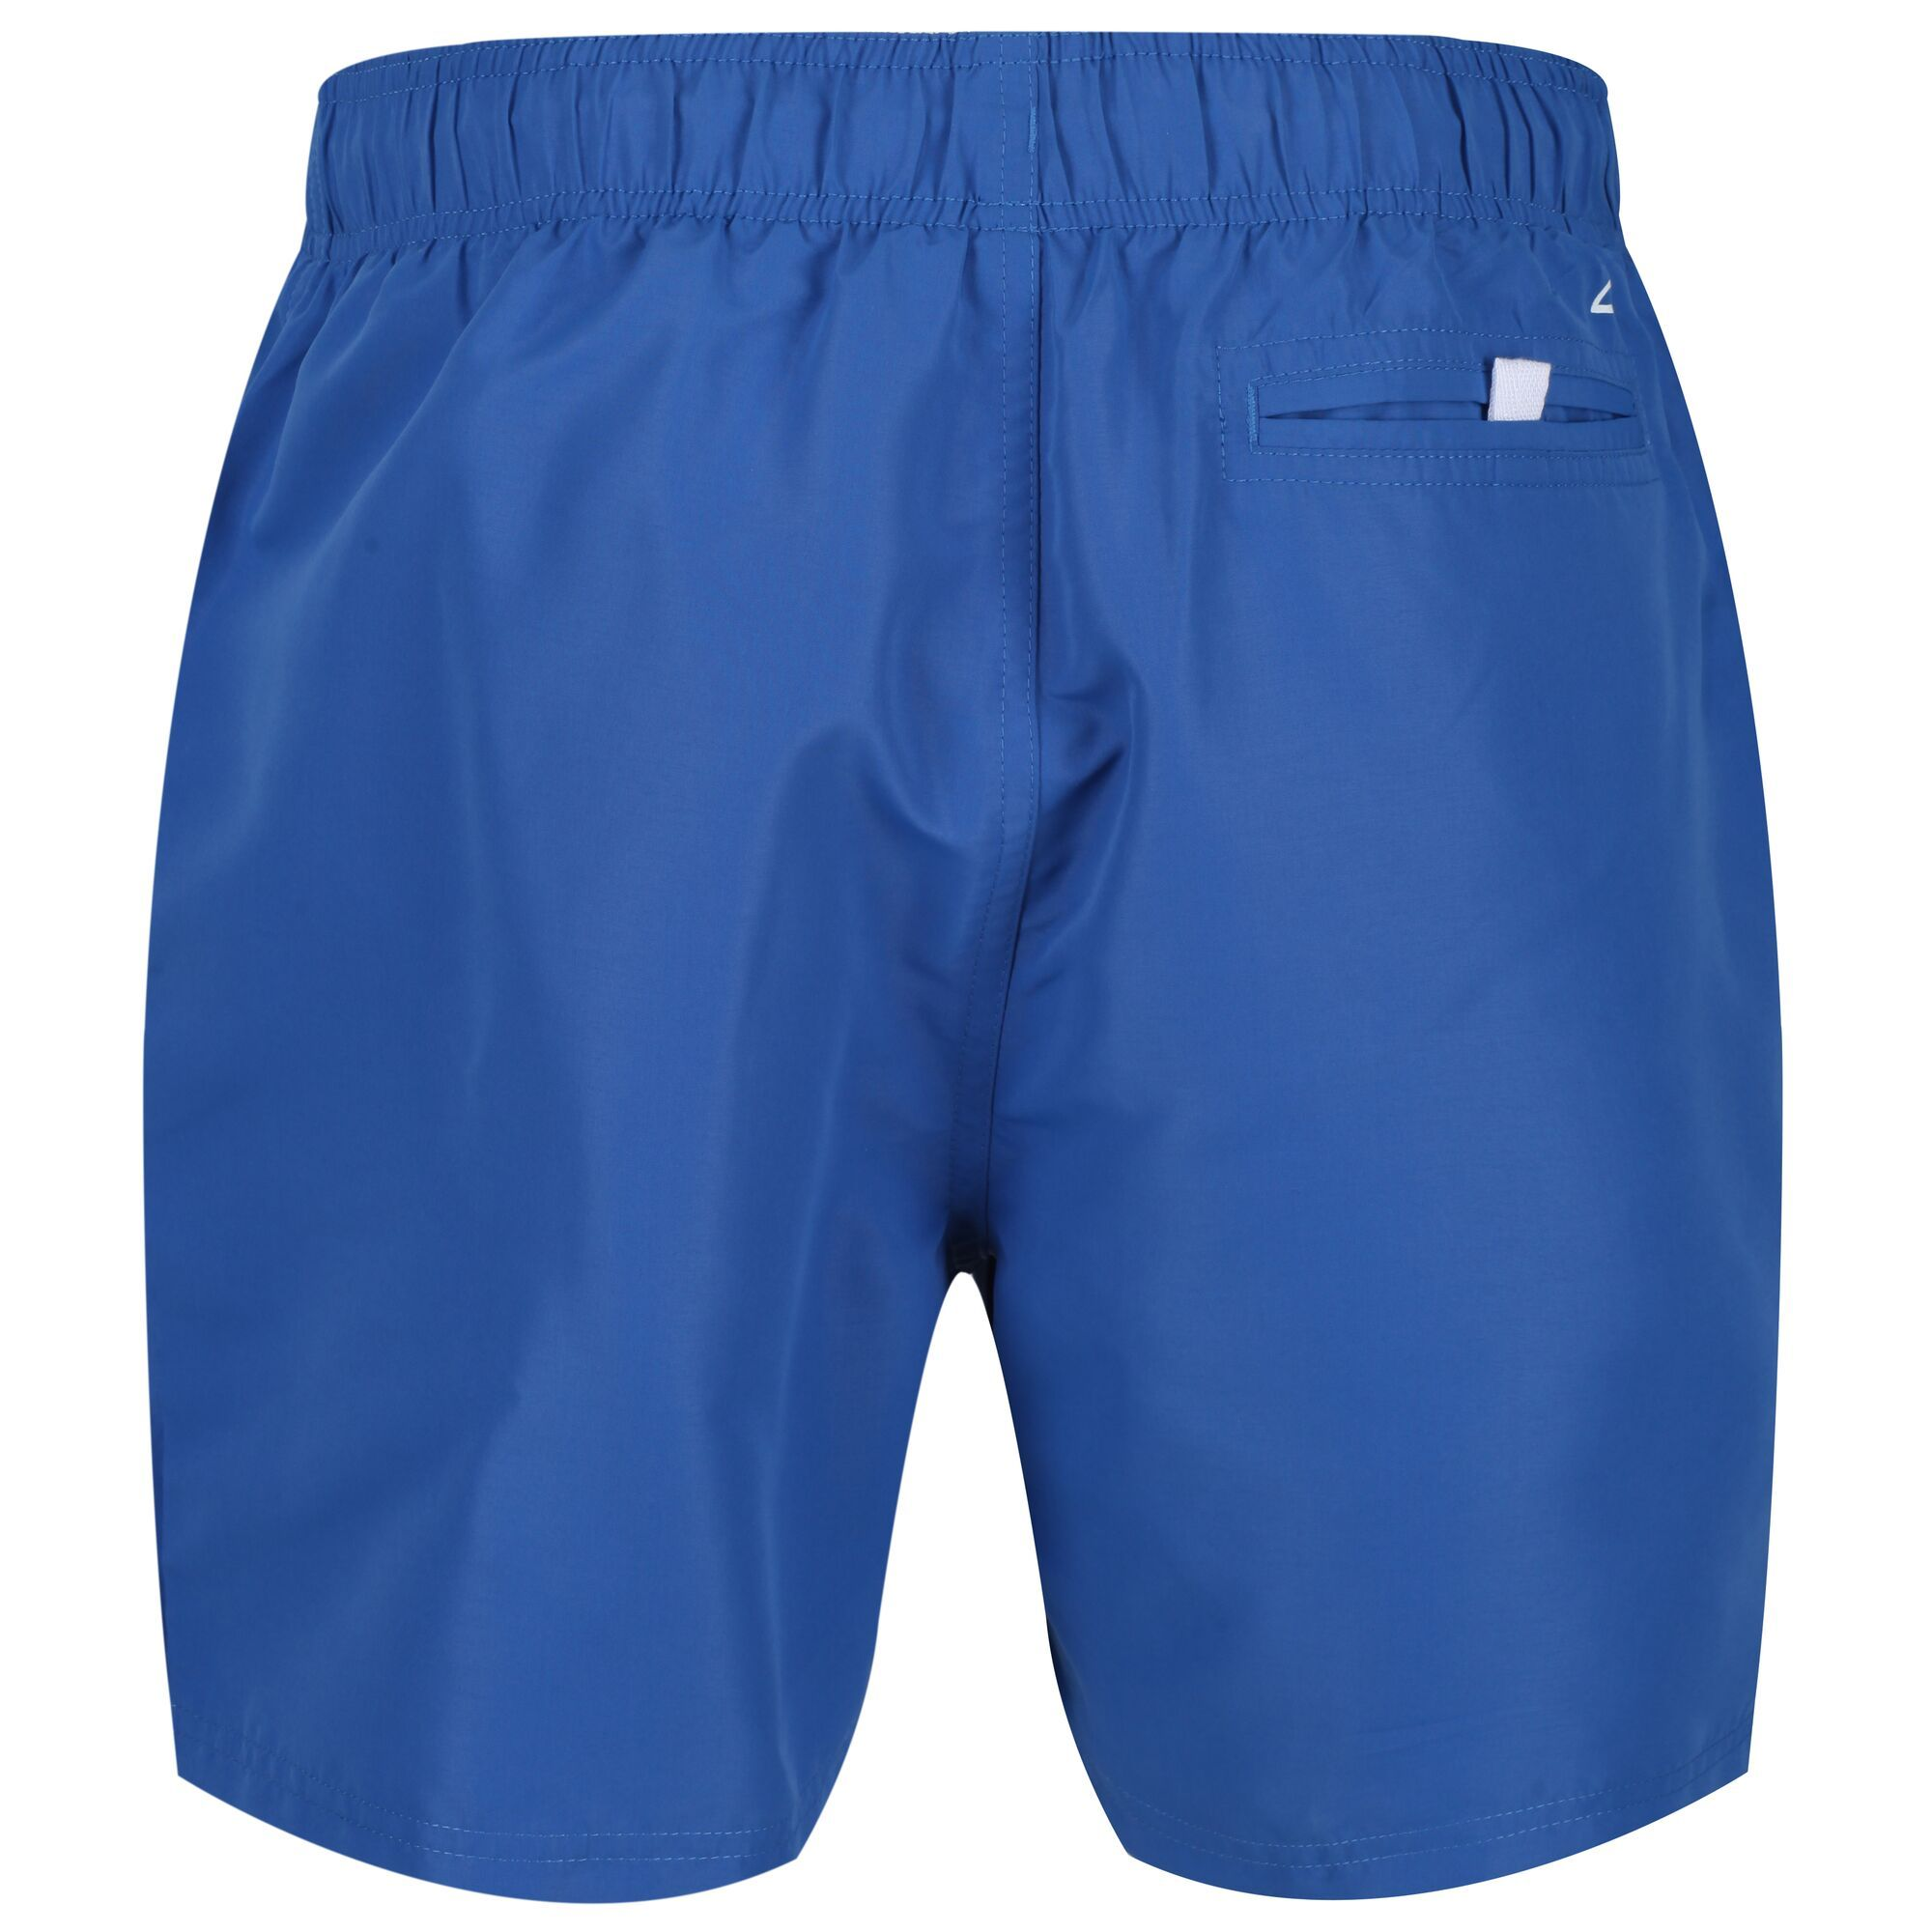 Regatta Mens Mawson II Swim Shorts (Nautical Blue)